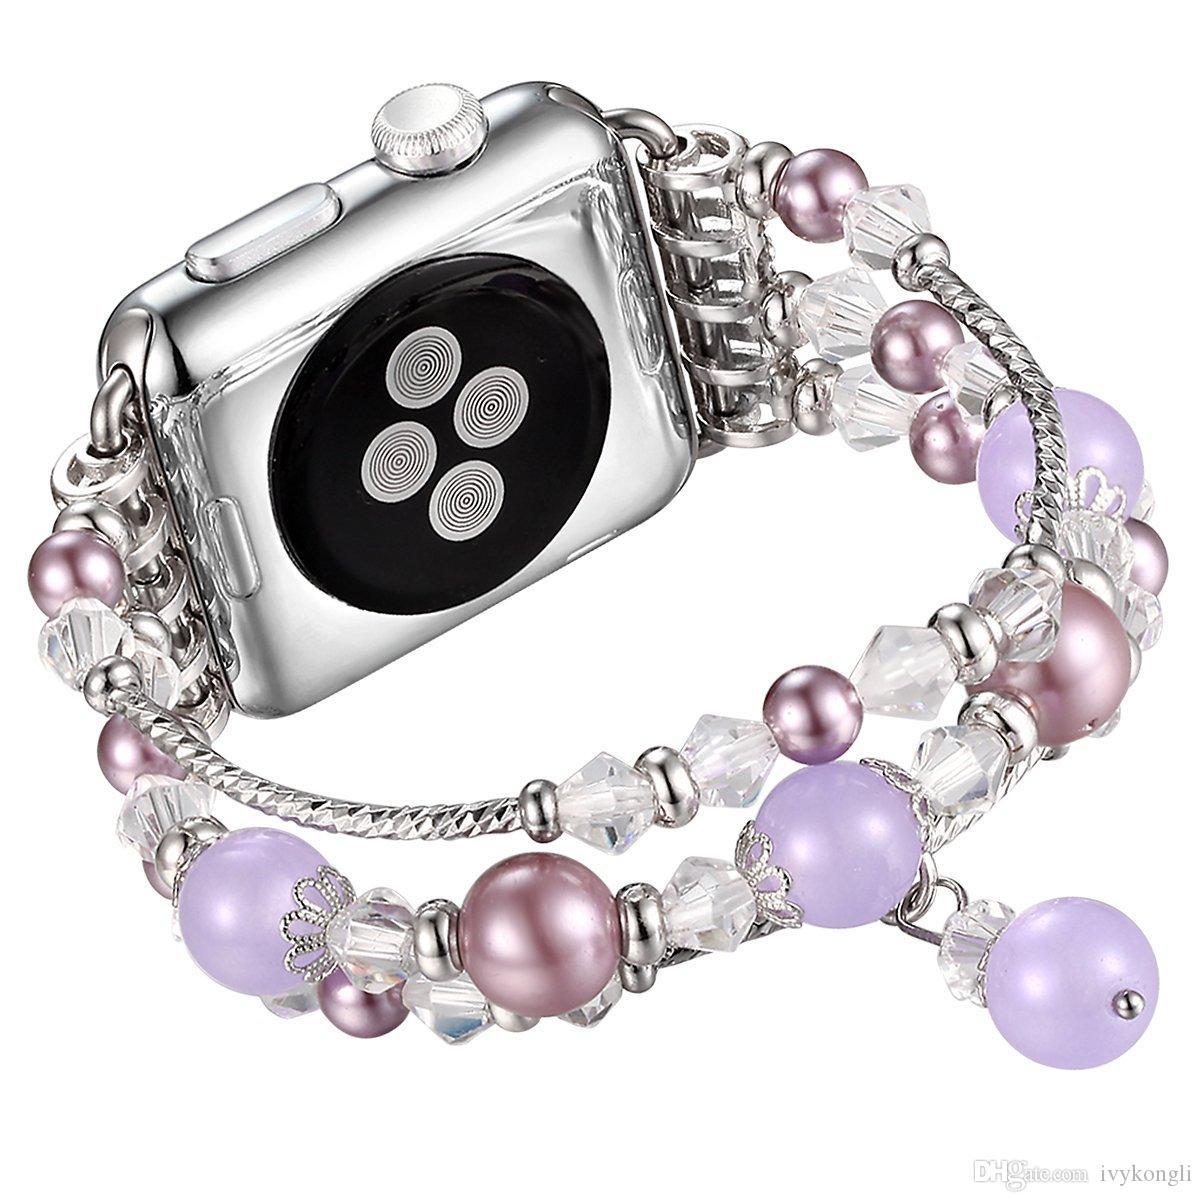 Banda de reloj Apple, correa de banda de pulsera elástica moldeada de reemplazo de reemplazo para 38mm / 42 mm Apple Watch Series 3/2/1